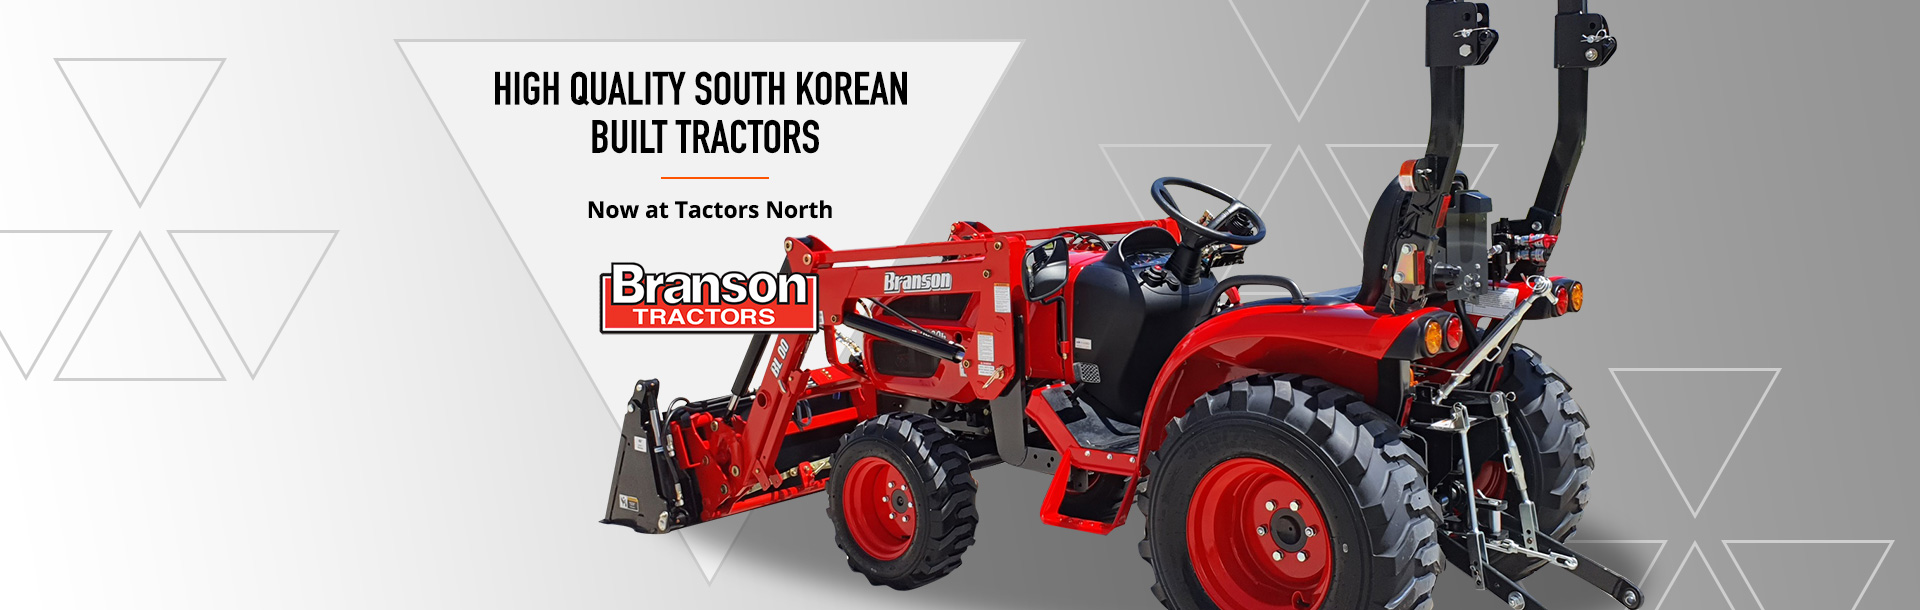 Tumosan Tractors